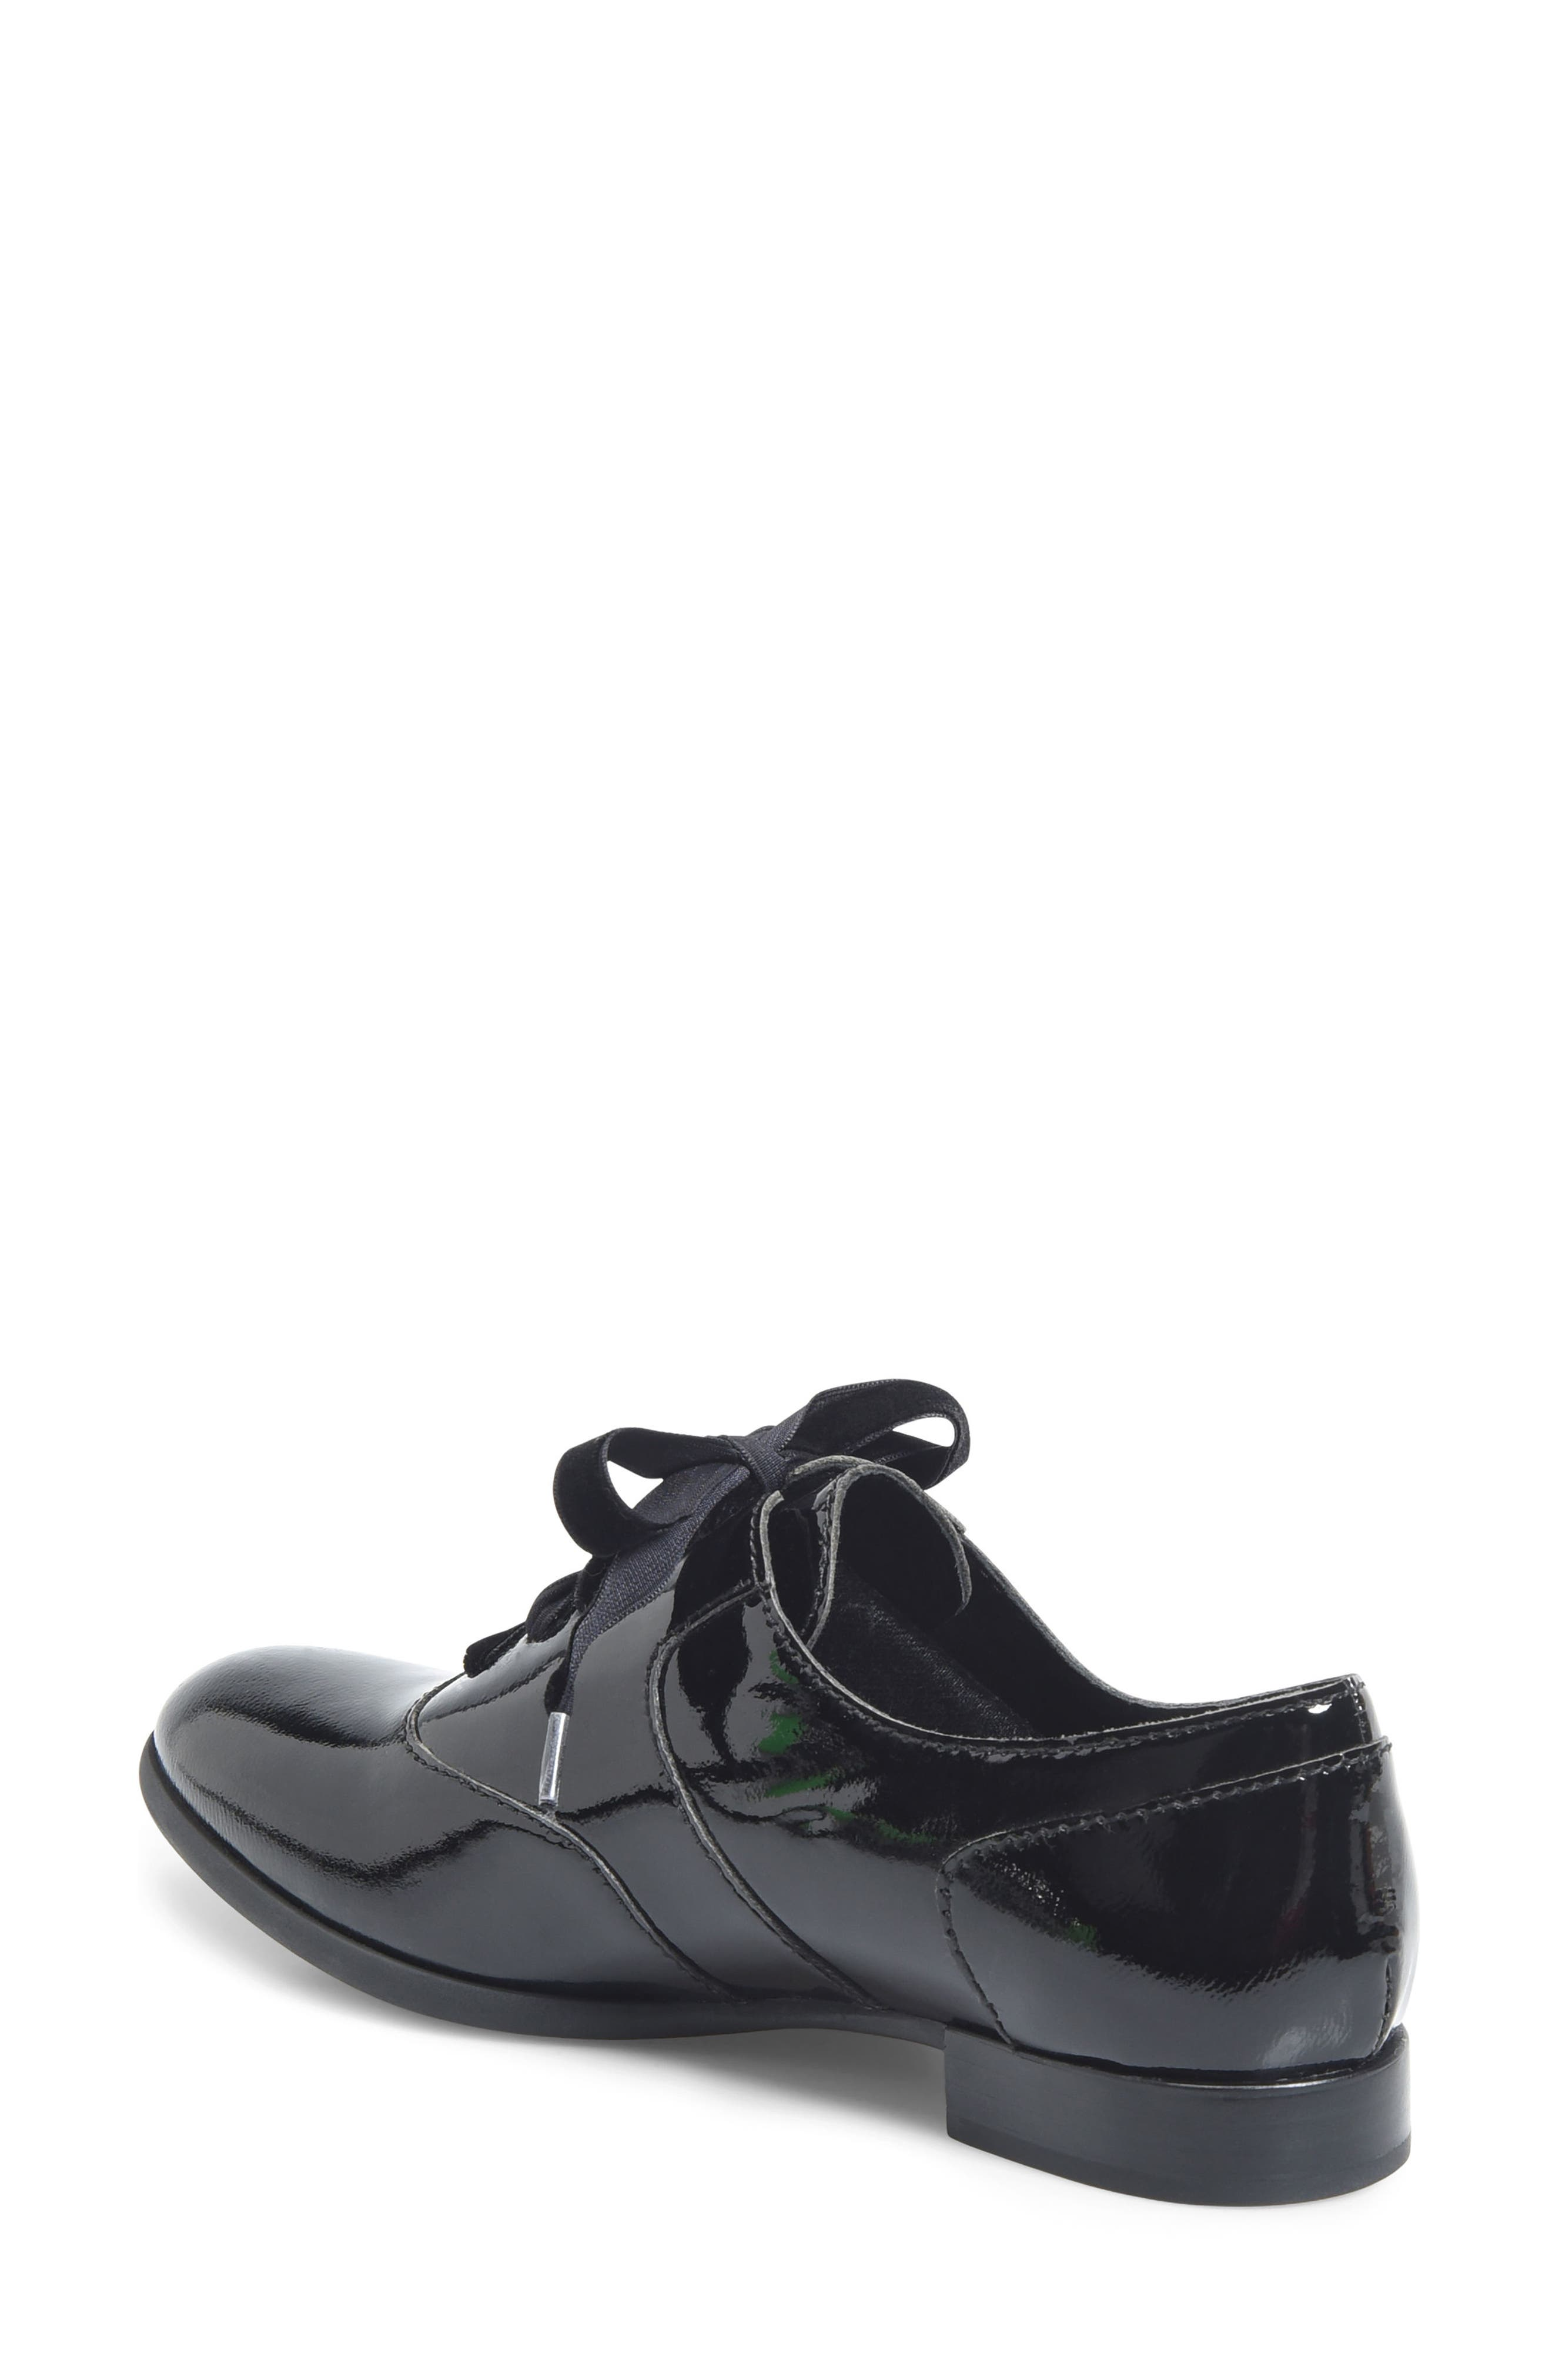 Eden Flat,                             Alternate thumbnail 2, color,                             Black Patent Leather